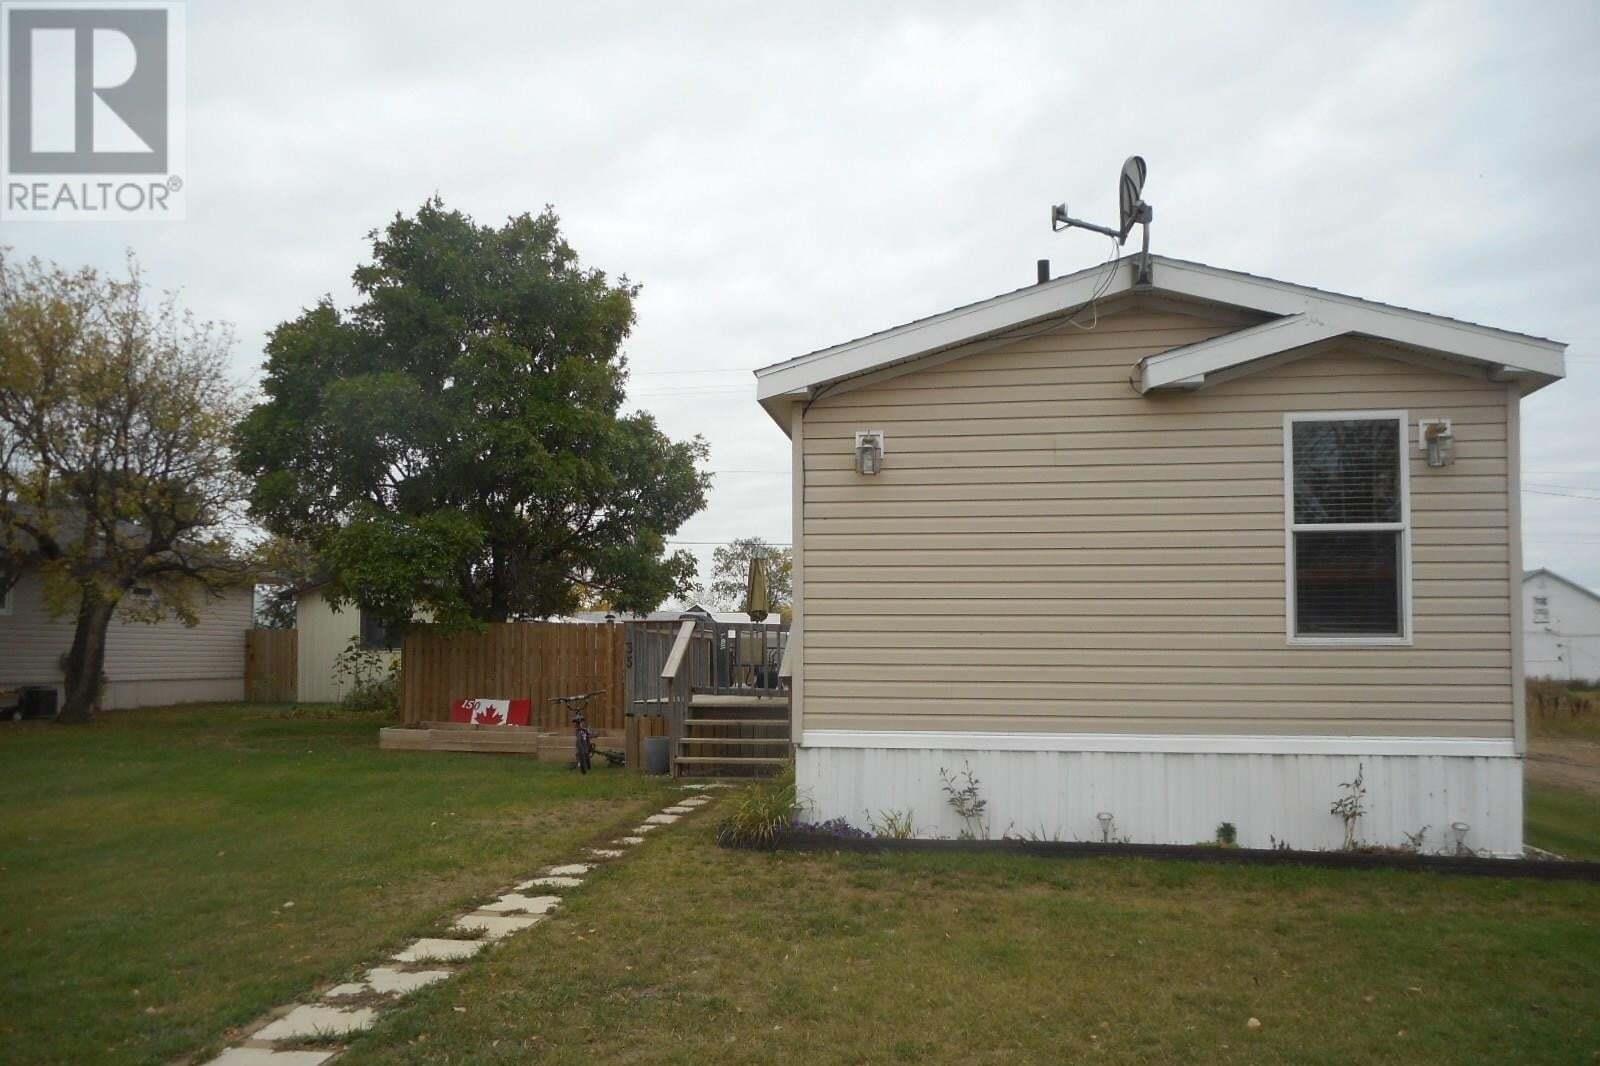 Residential property for sale at 135 Torbay St Torquay Saskatchewan - MLS: SK799537